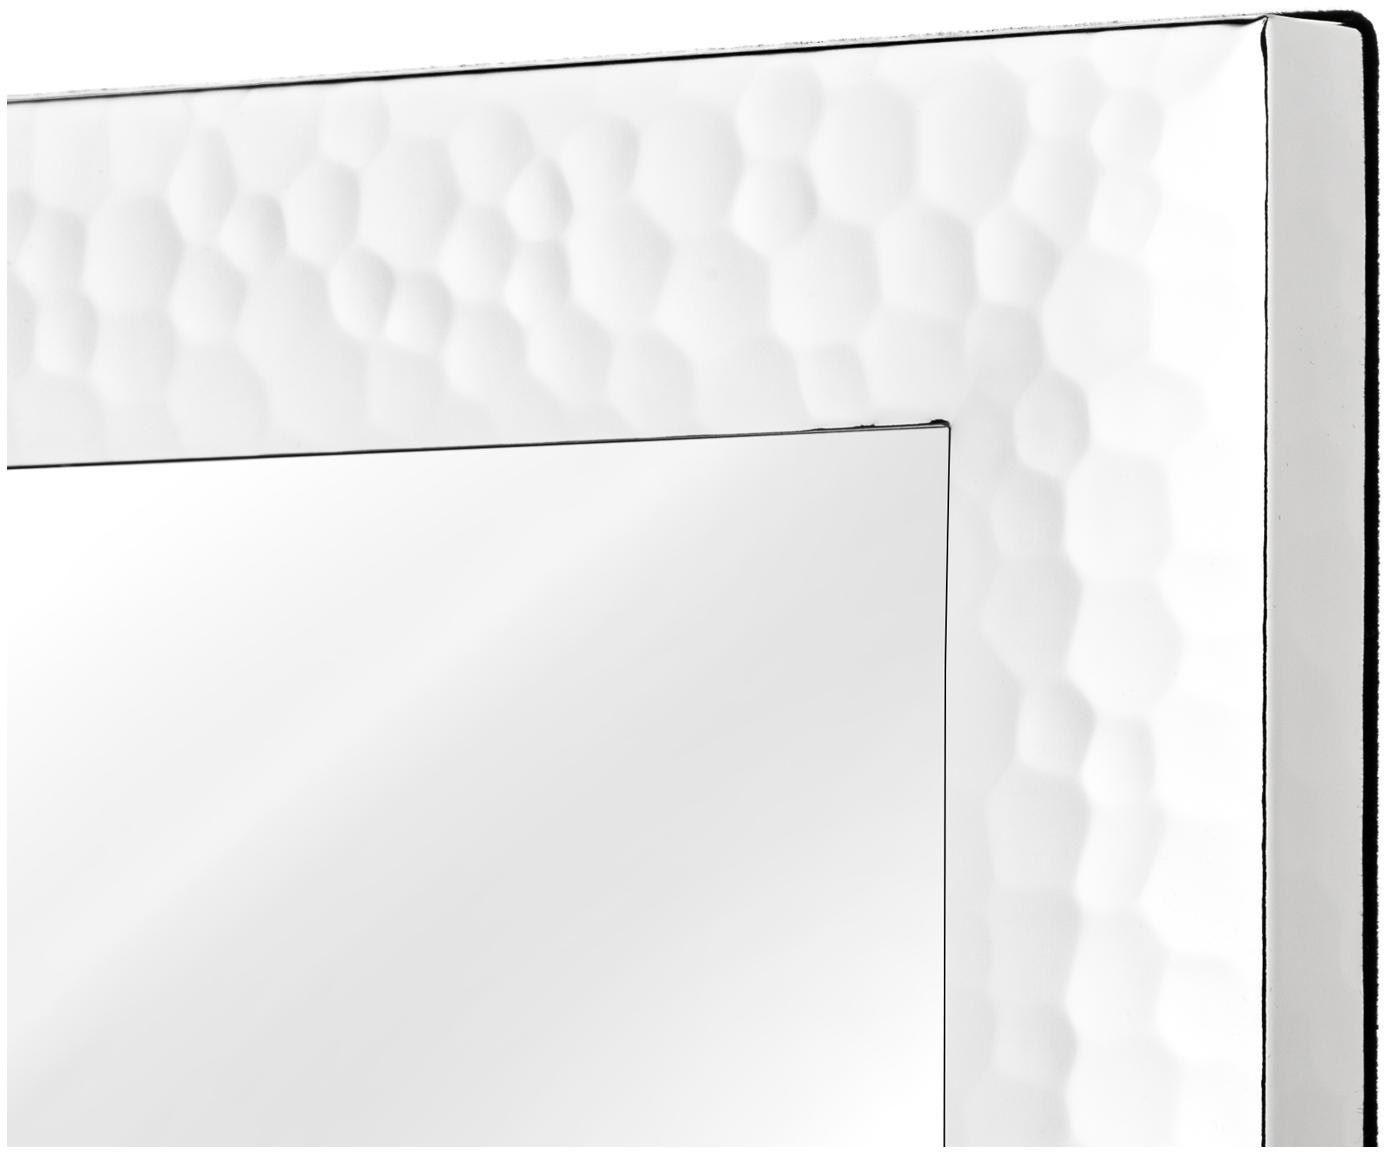 Ramka na zdjęcia Gubbio, Srebrny, 13 x 18 cm